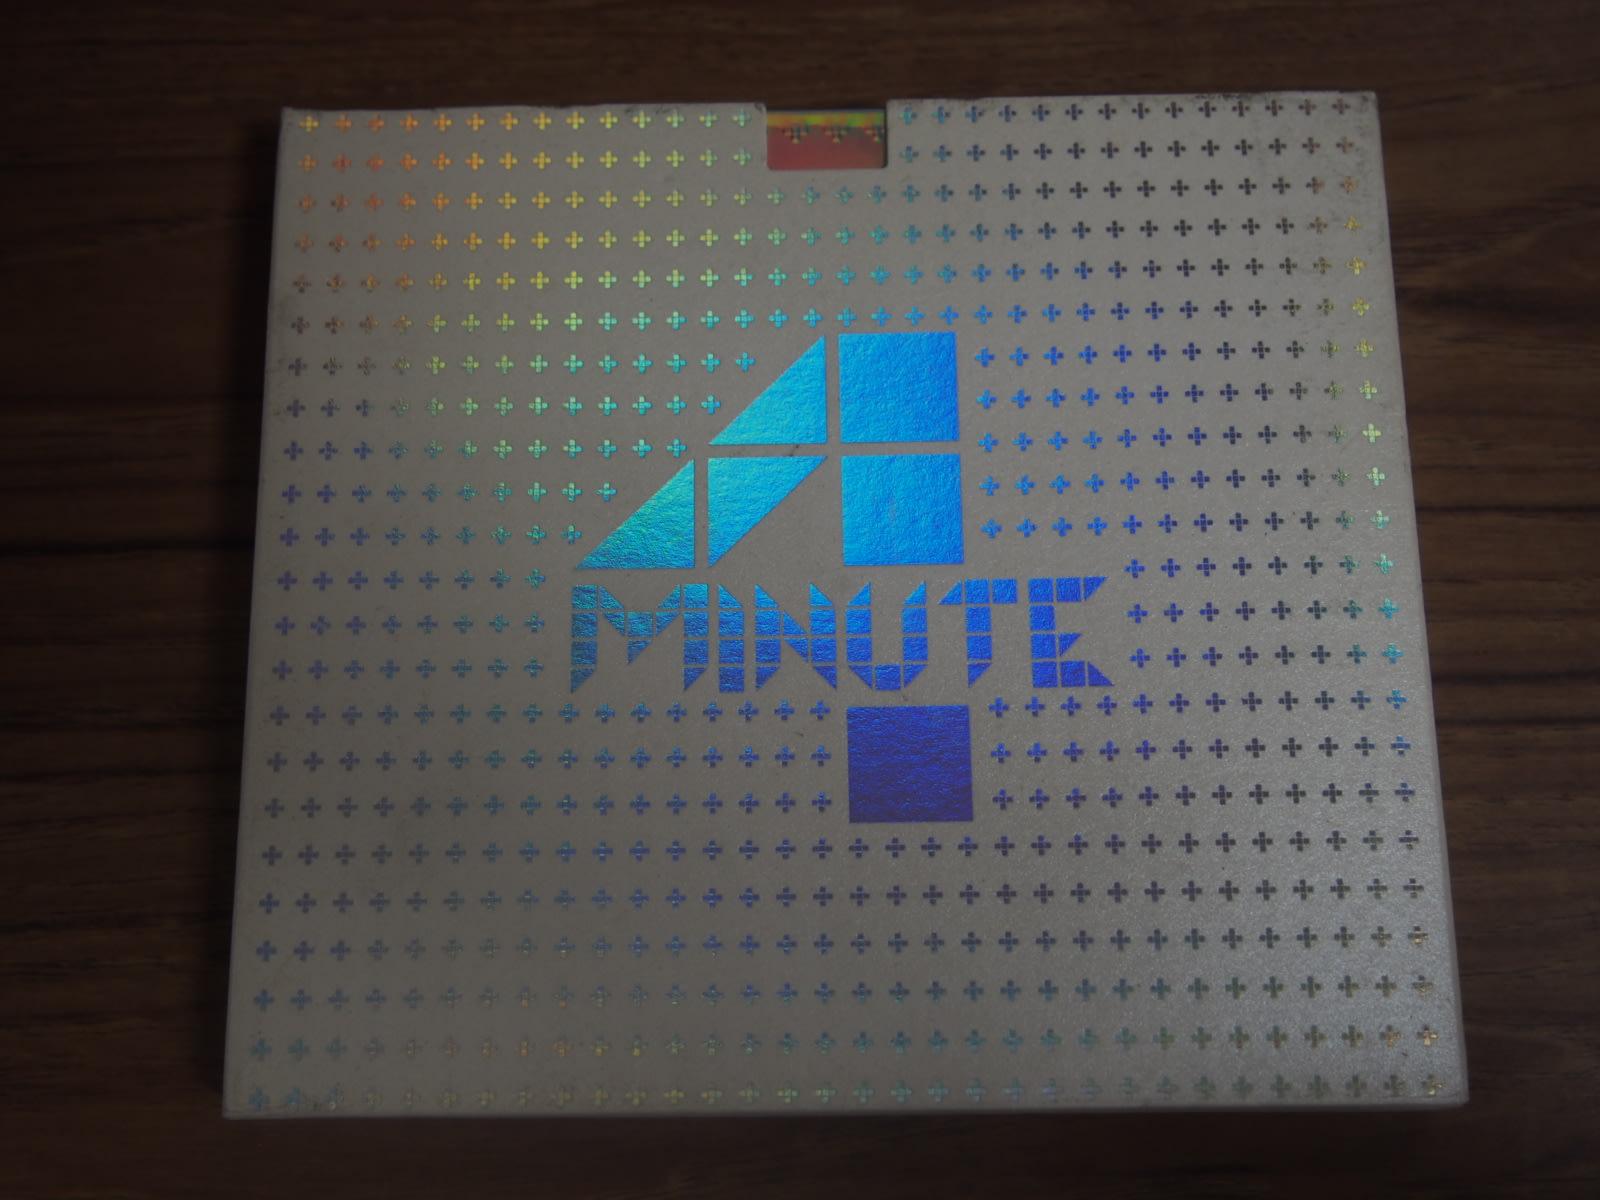 ◎MWM◎【二手CD】韓國 4Minute the first mini album for muzk 品項如圖